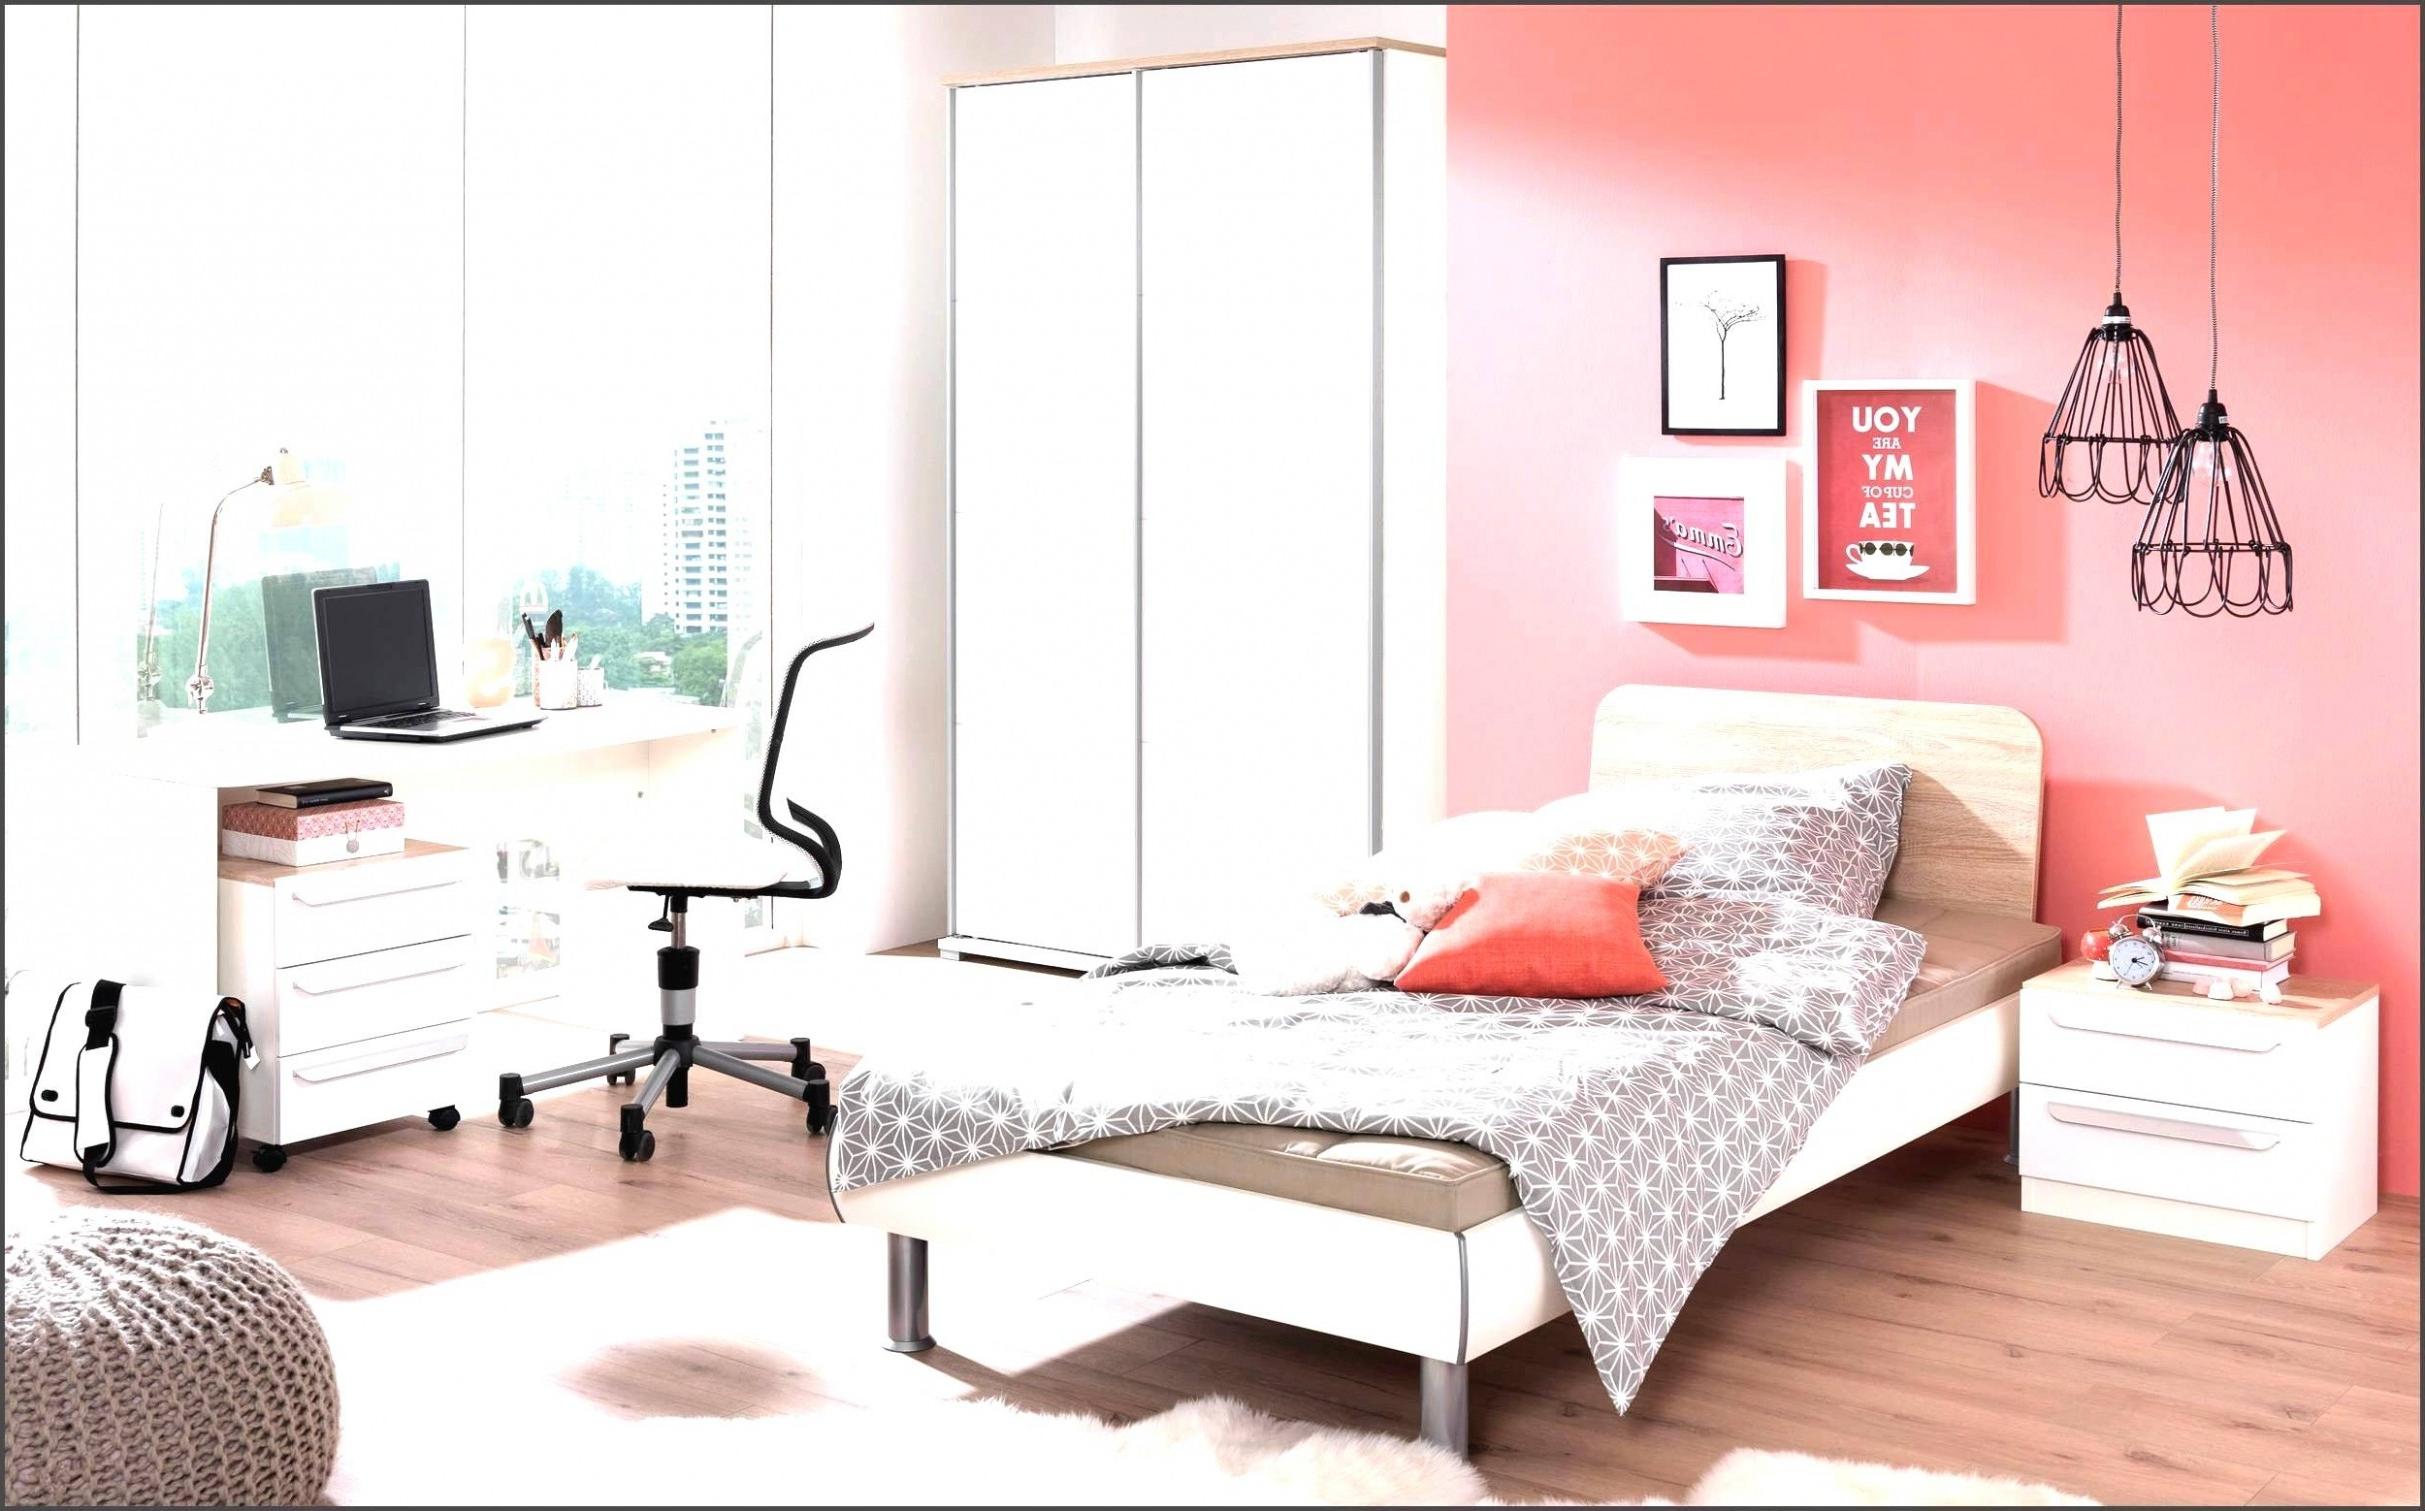 Full Size of Coole Betten Sofabett Mit Bettkasten Genial Schlafsofa Yrwrmulj 90x200 Weiß Ausgefallene Dänisches Bettenlager Badezimmer Outlet Günstig Kaufen Moebel De Bett Coole Betten